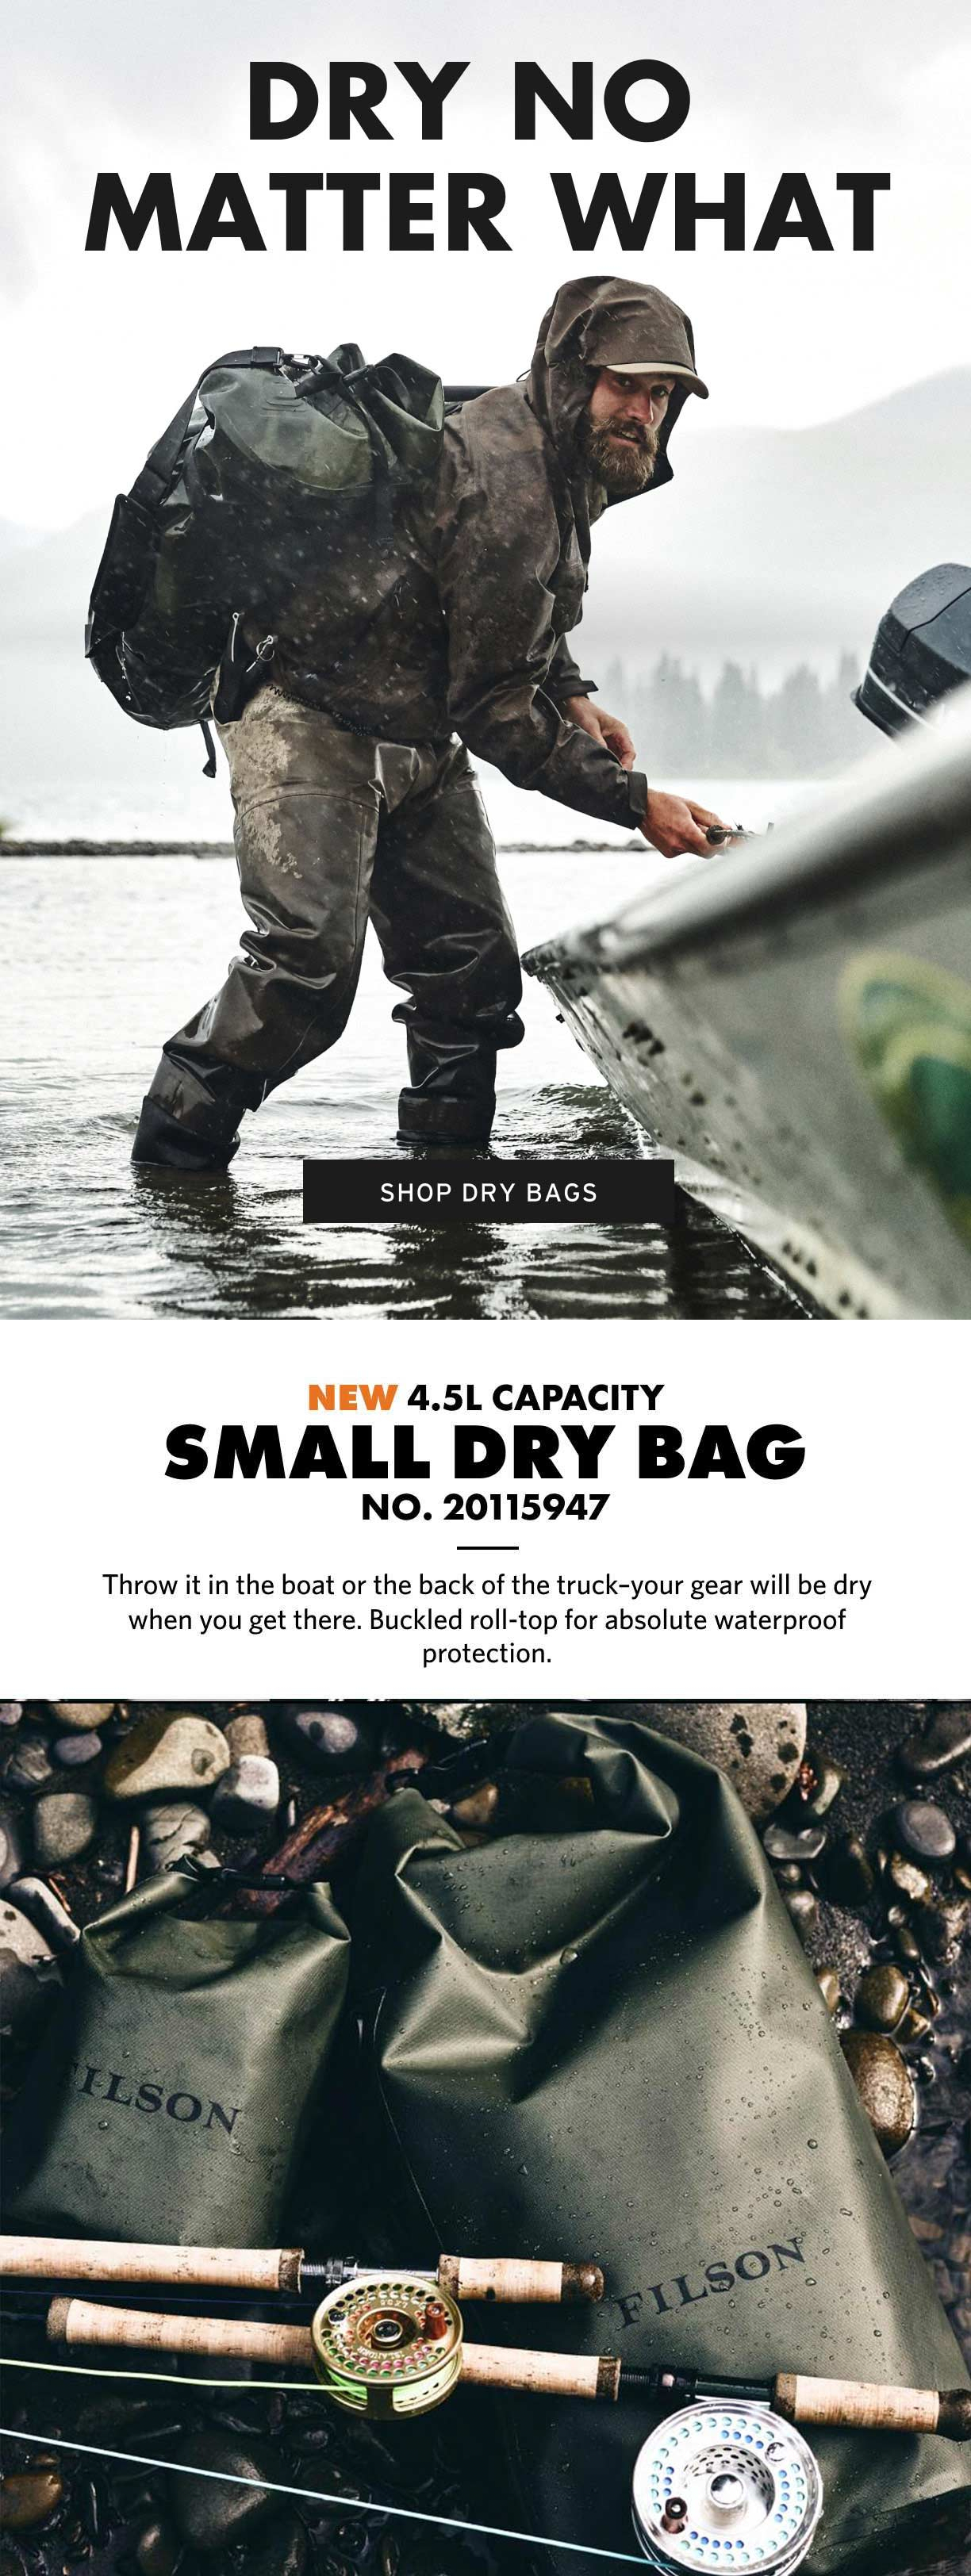 Filson Dry Bag Small Productinformation